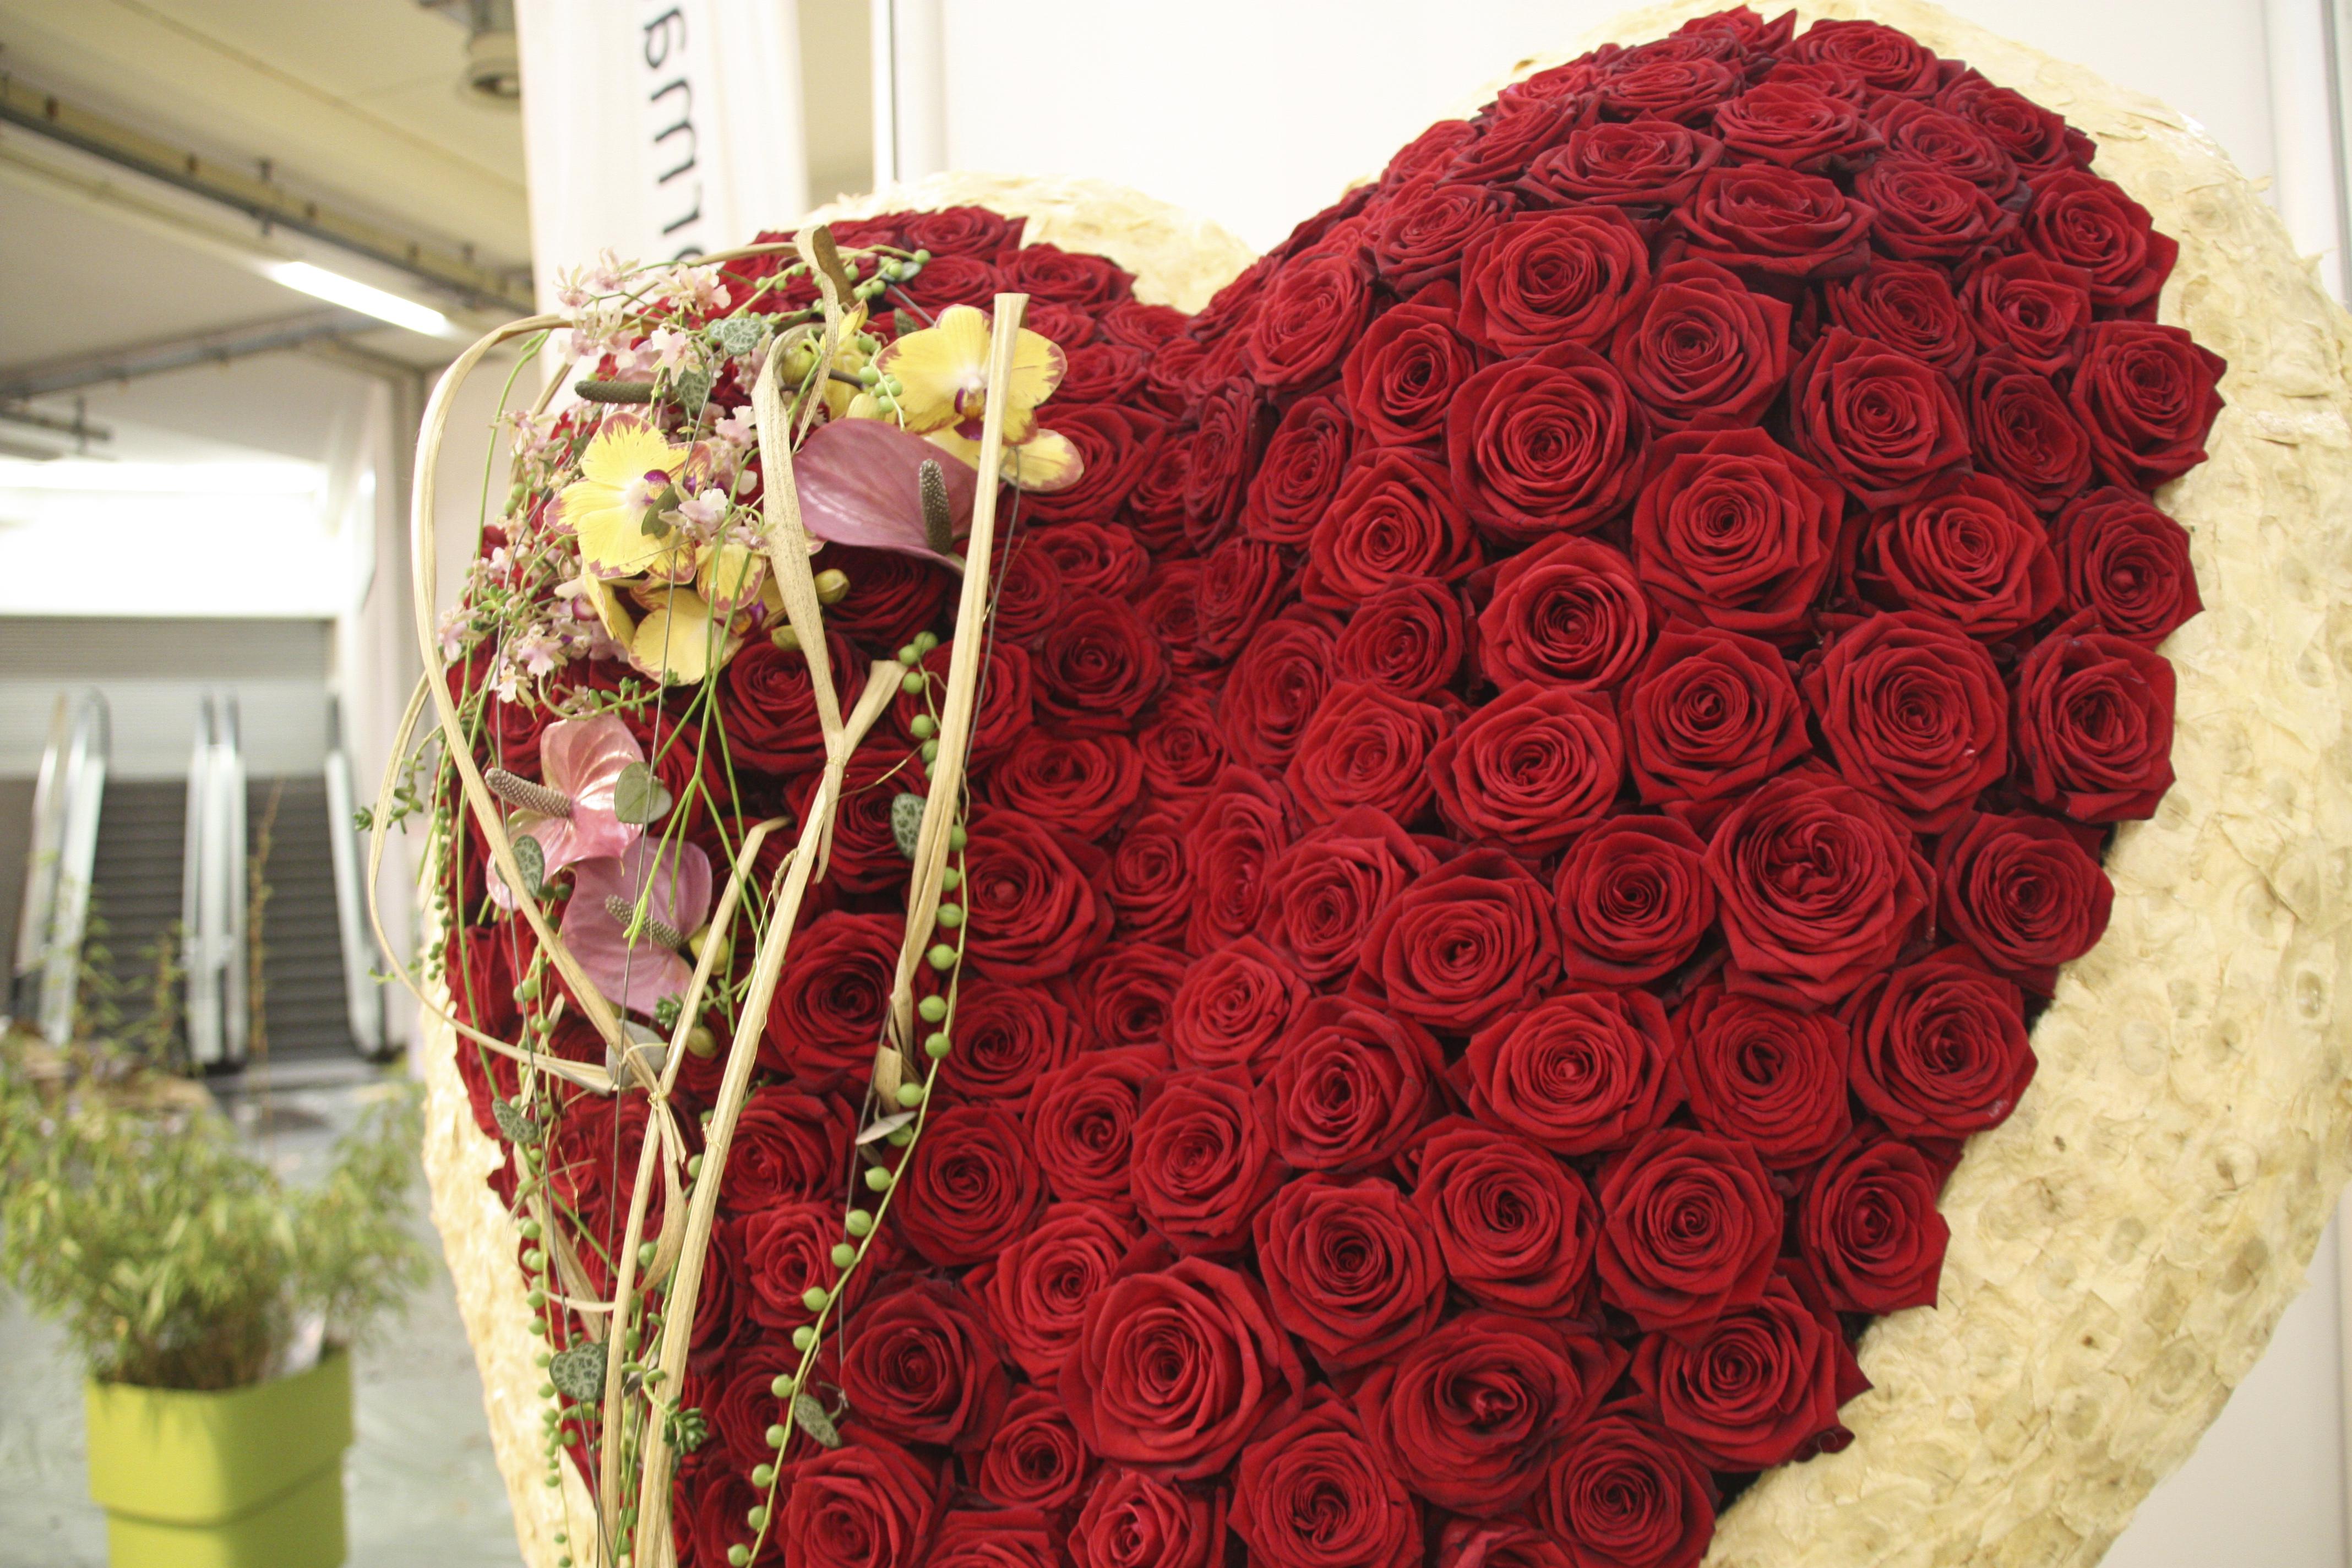 porta-nova-valentine-red-roses-_19[1]